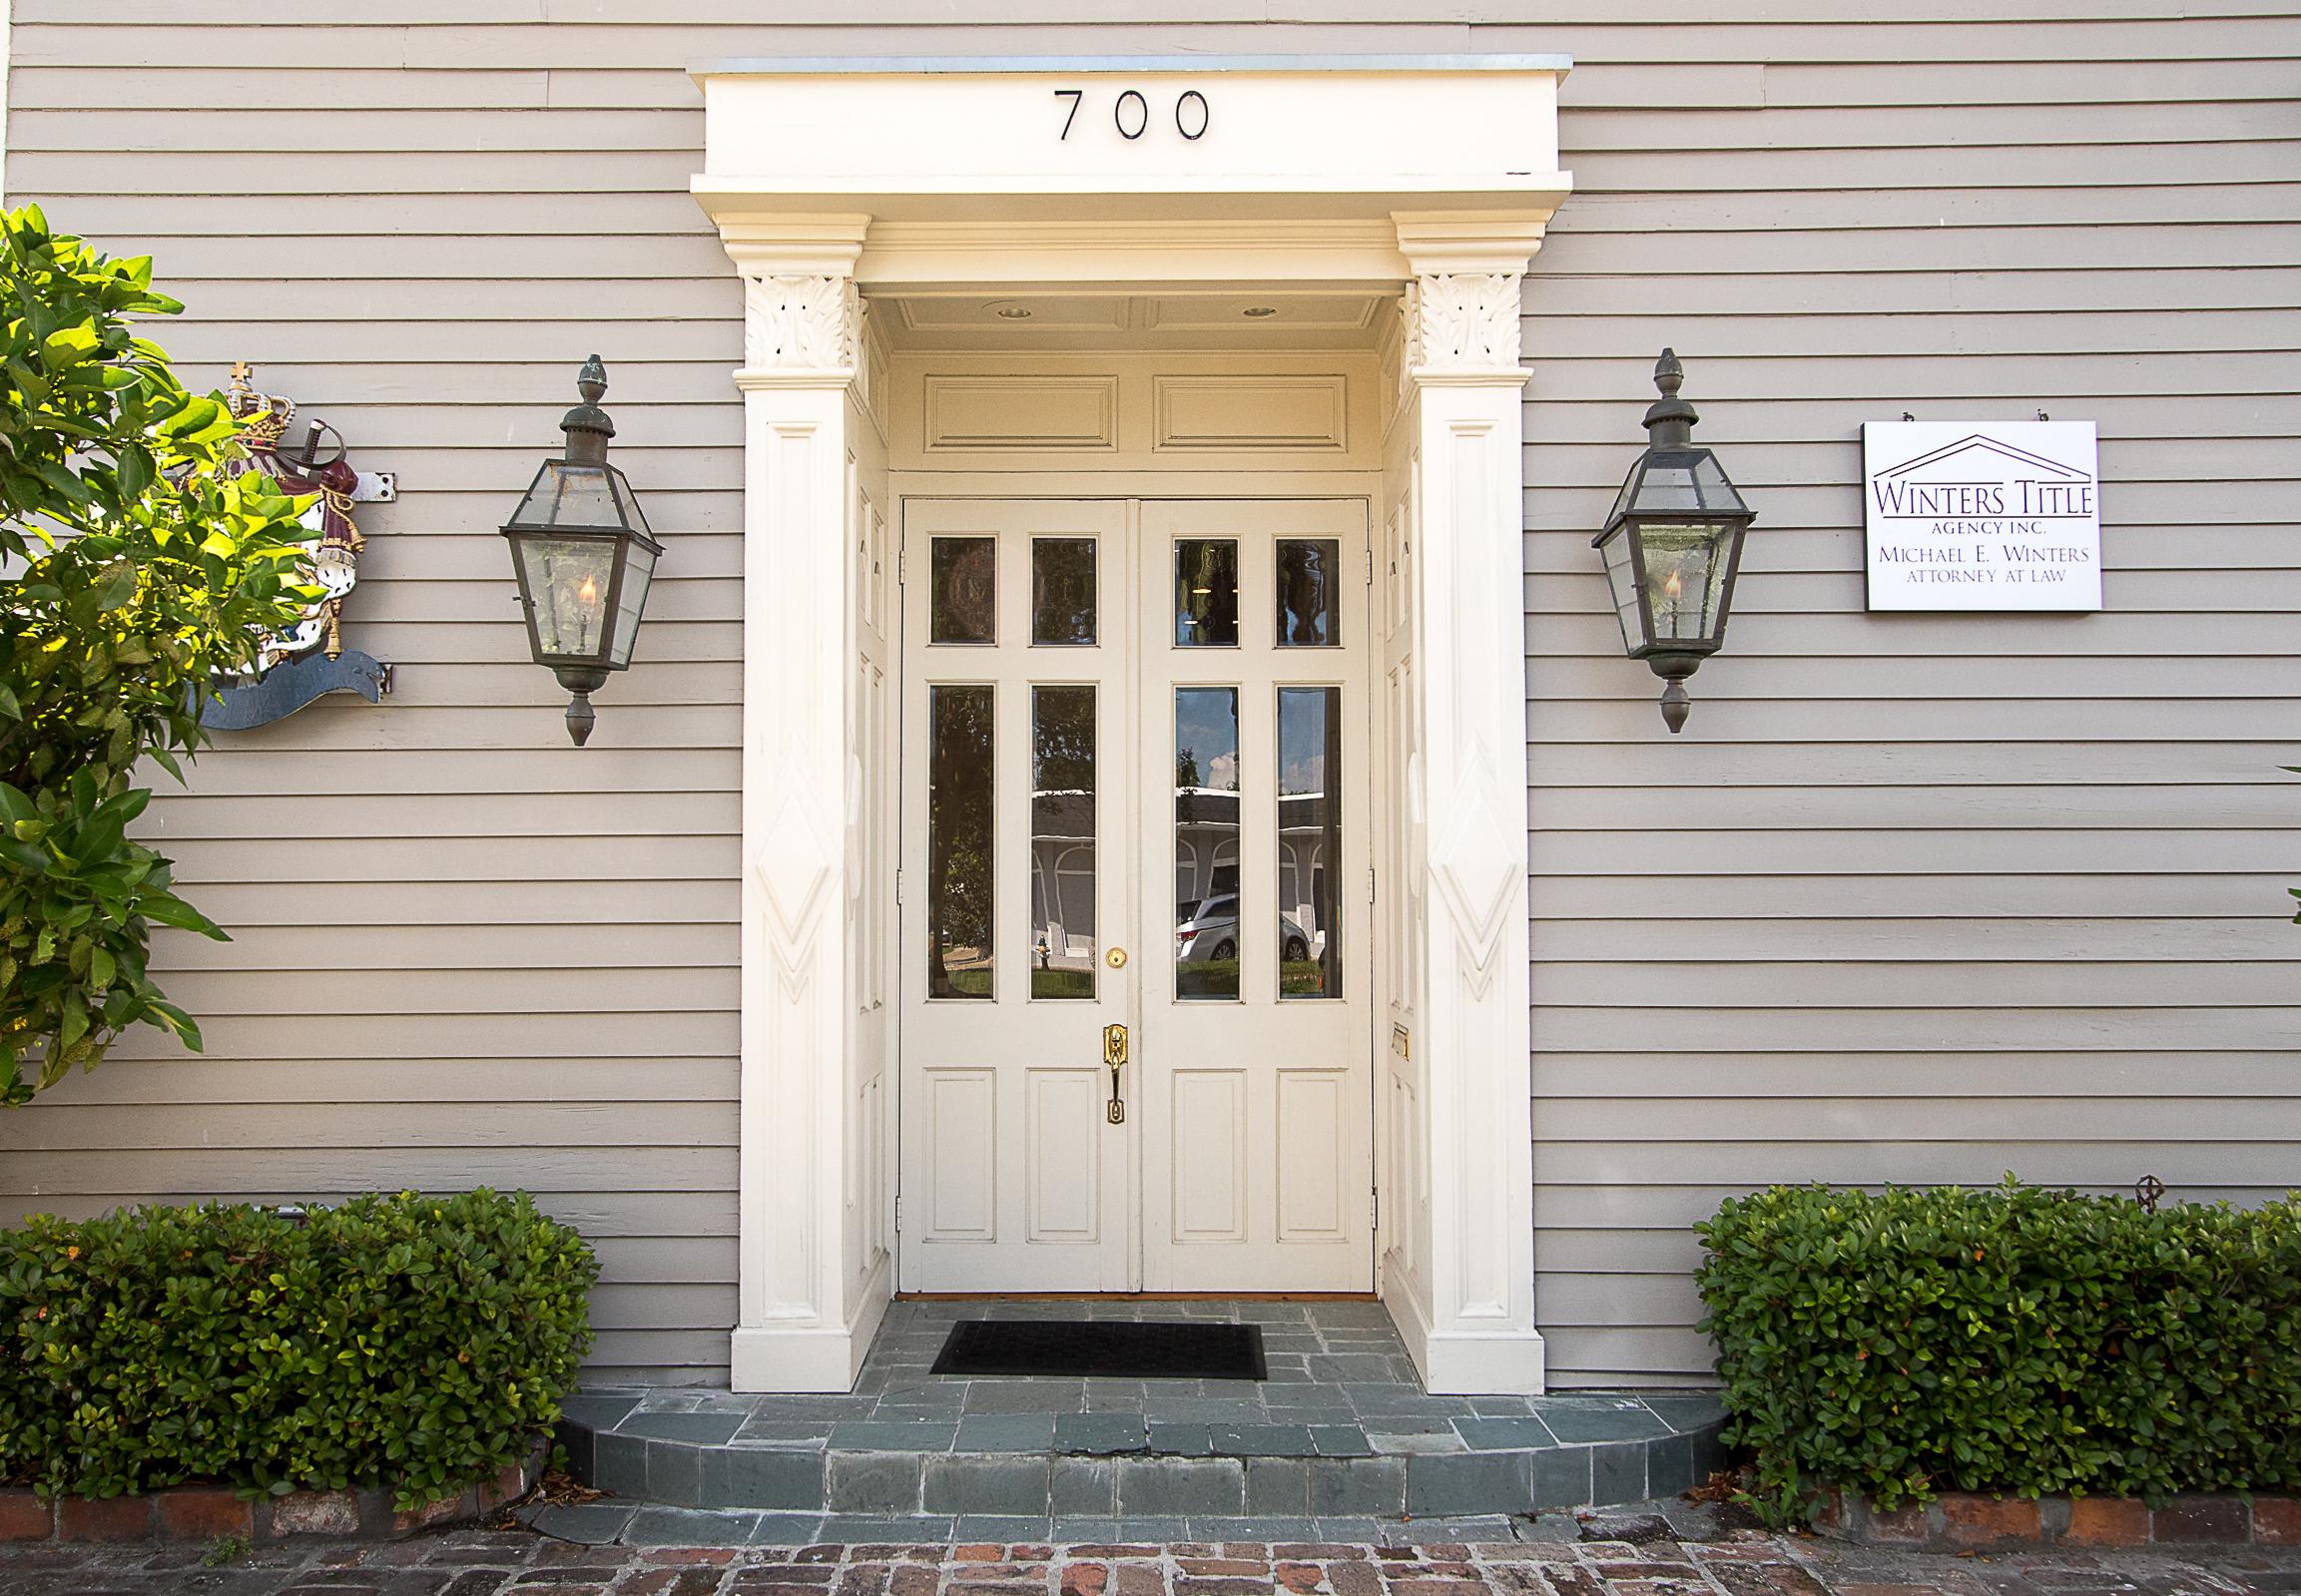 Uptown   700 Dublin  New Orleans, LA 70118